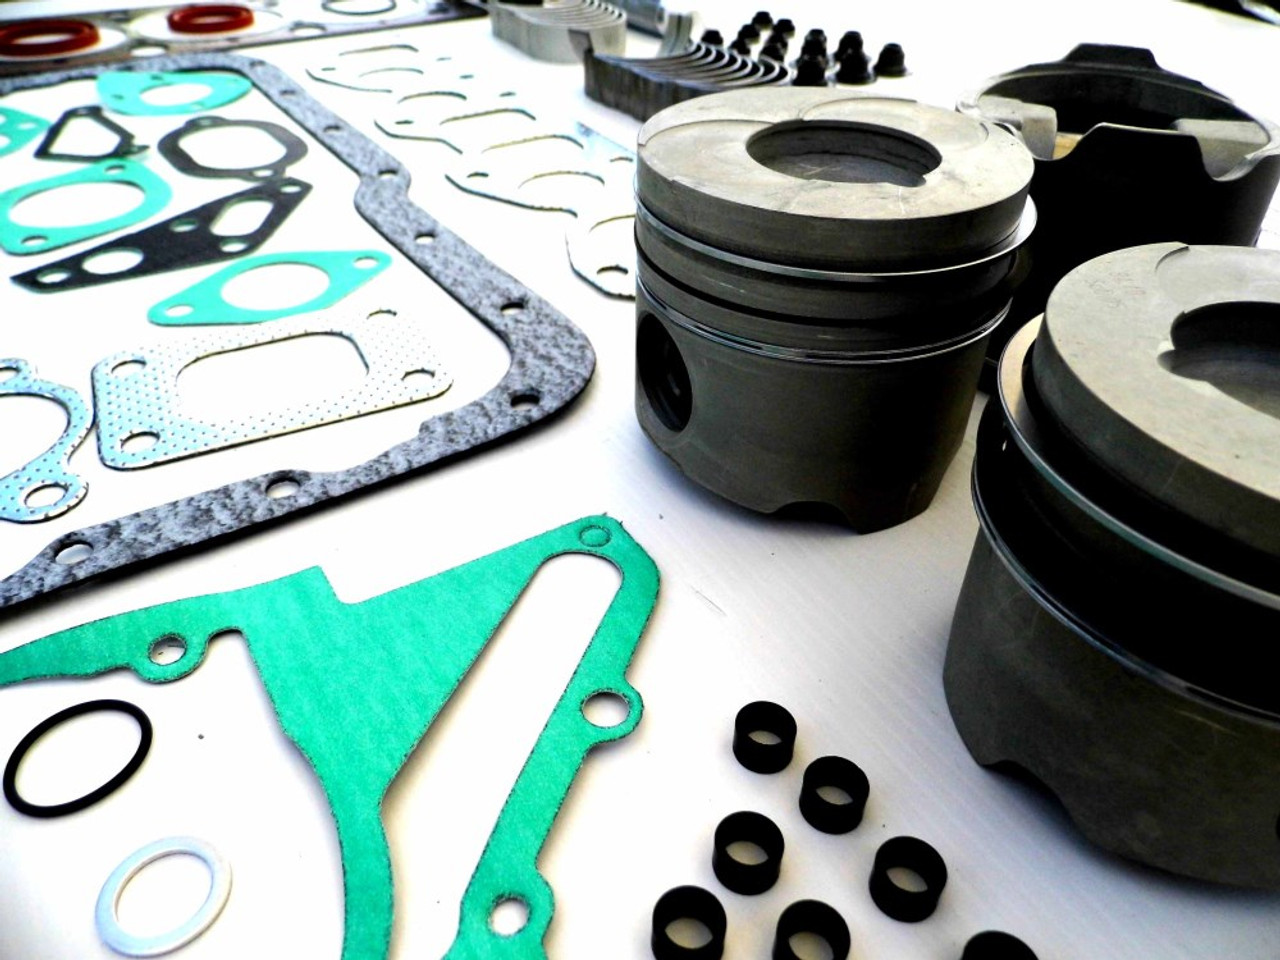 Volvo Penta TAMD22 engine overhaul kit from Parts4engines.com